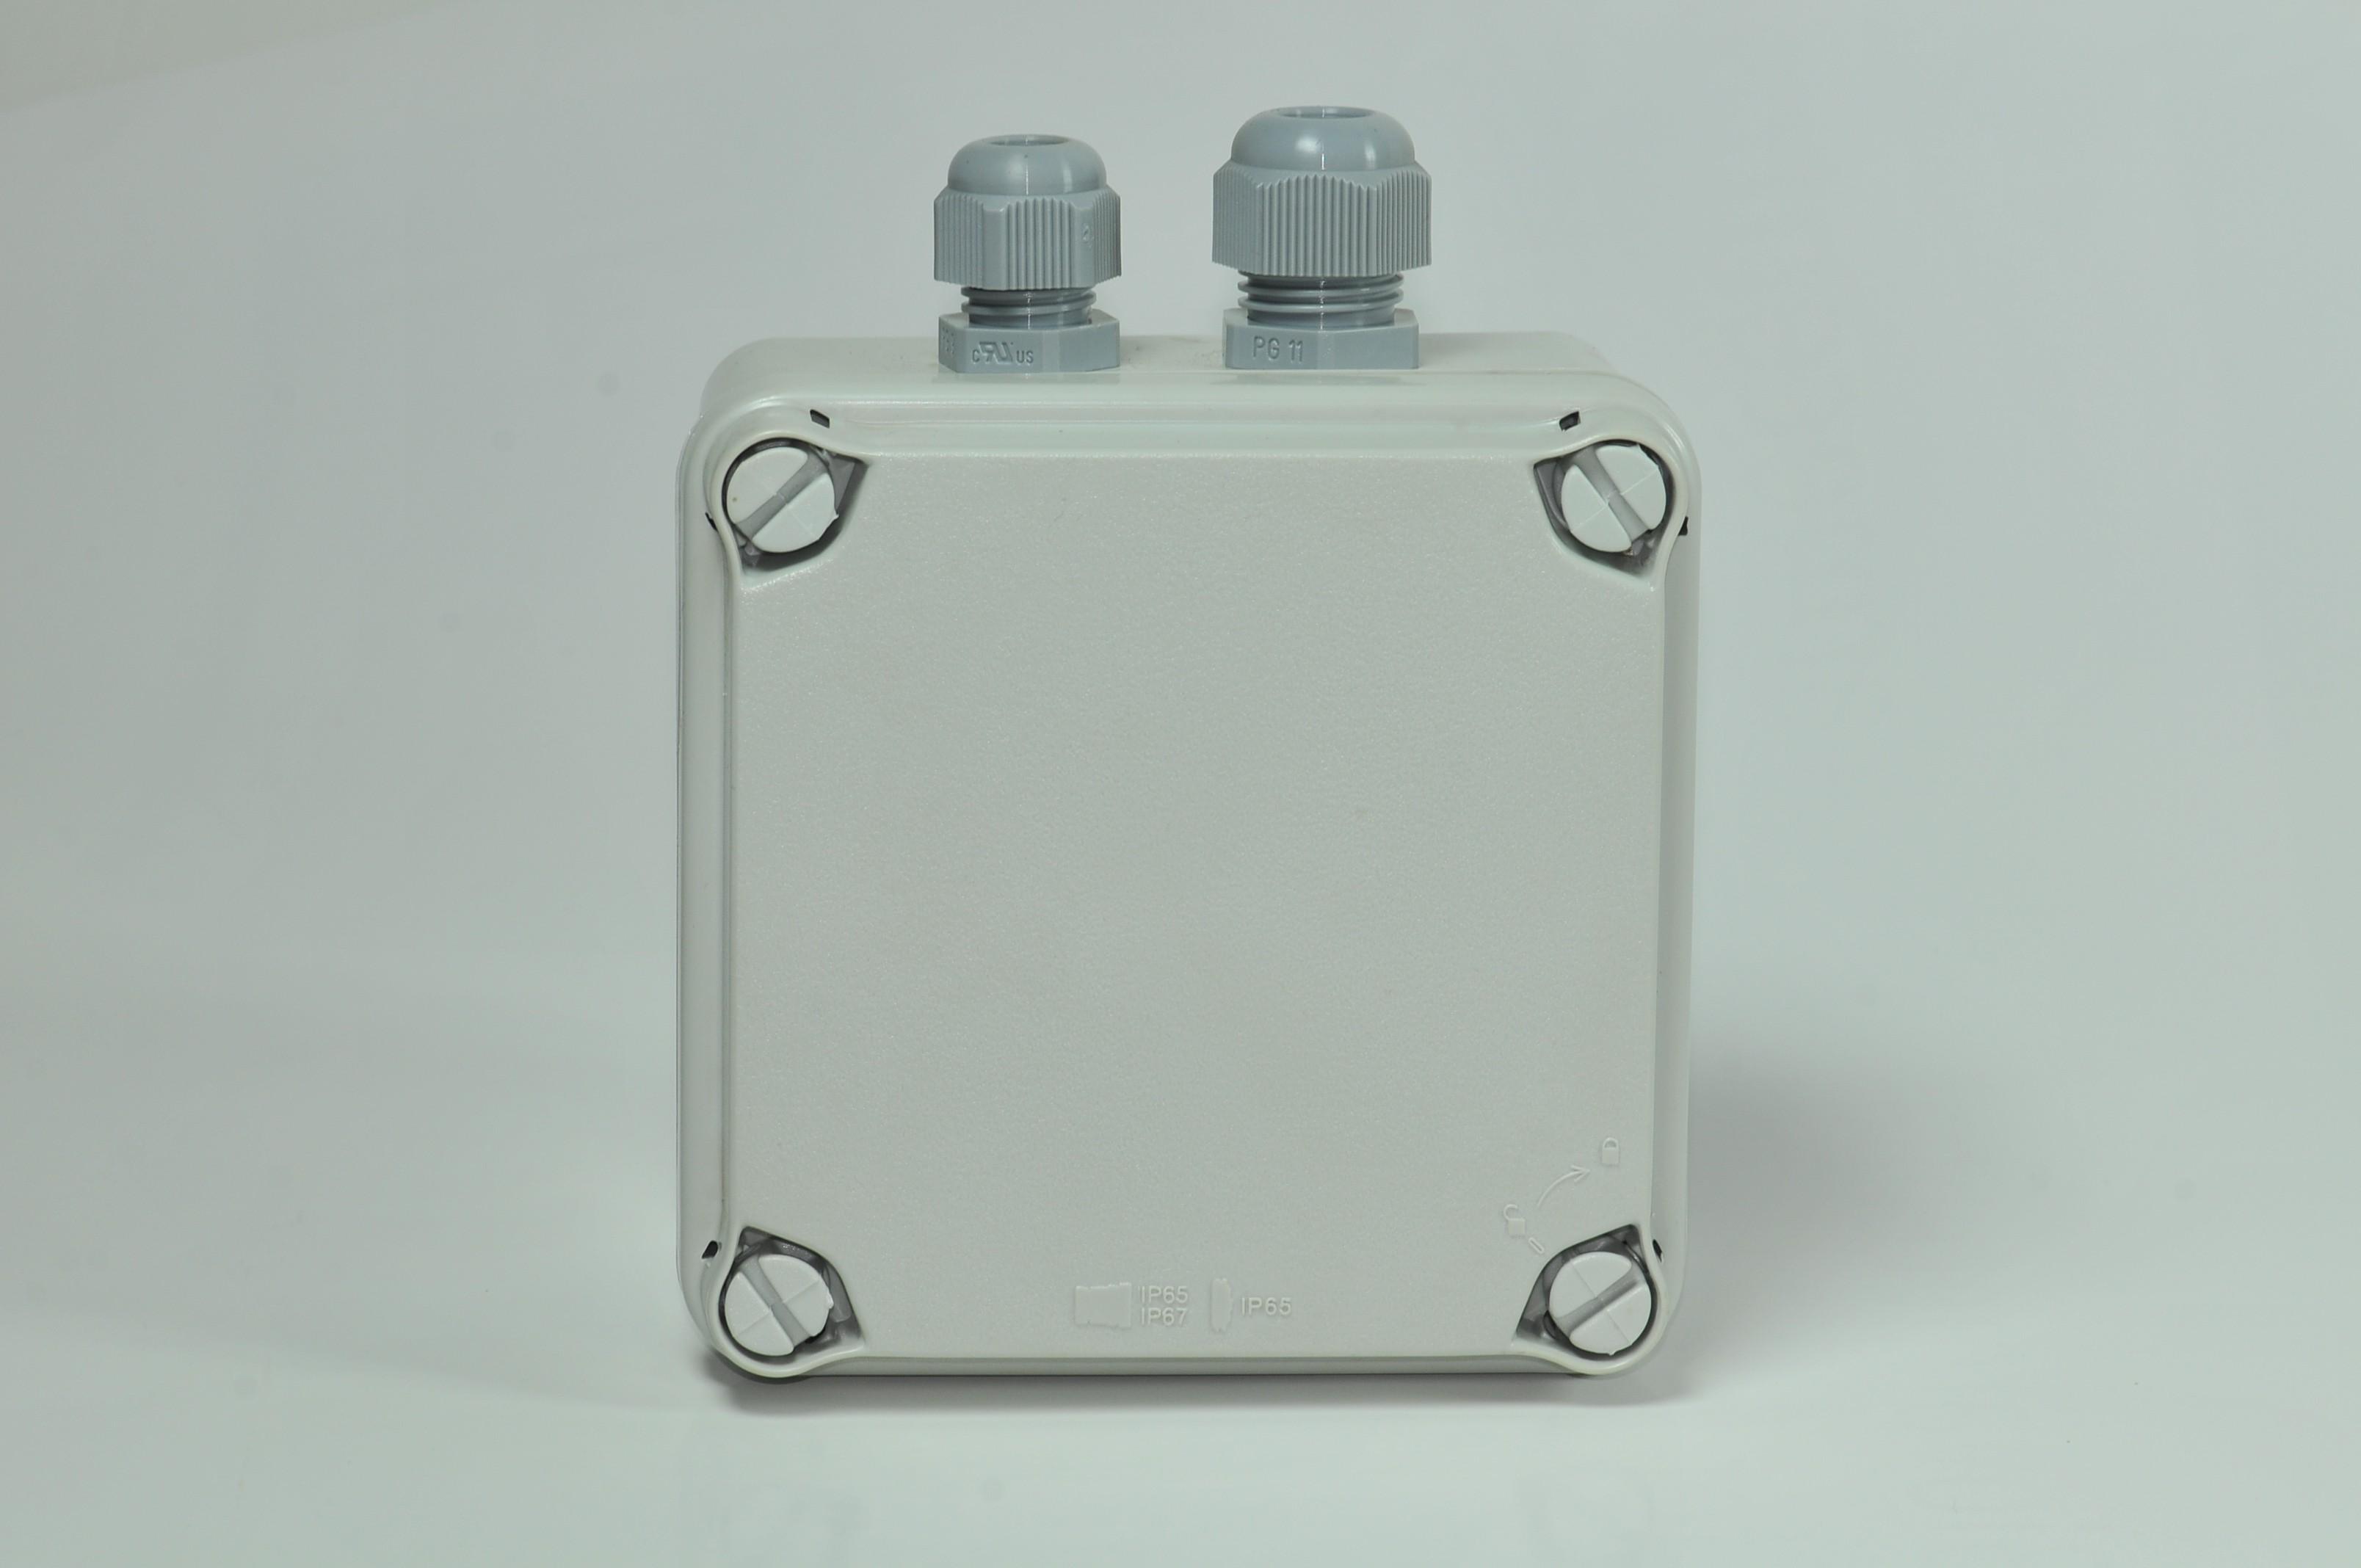 Kondensaattorikotelo 4 µF